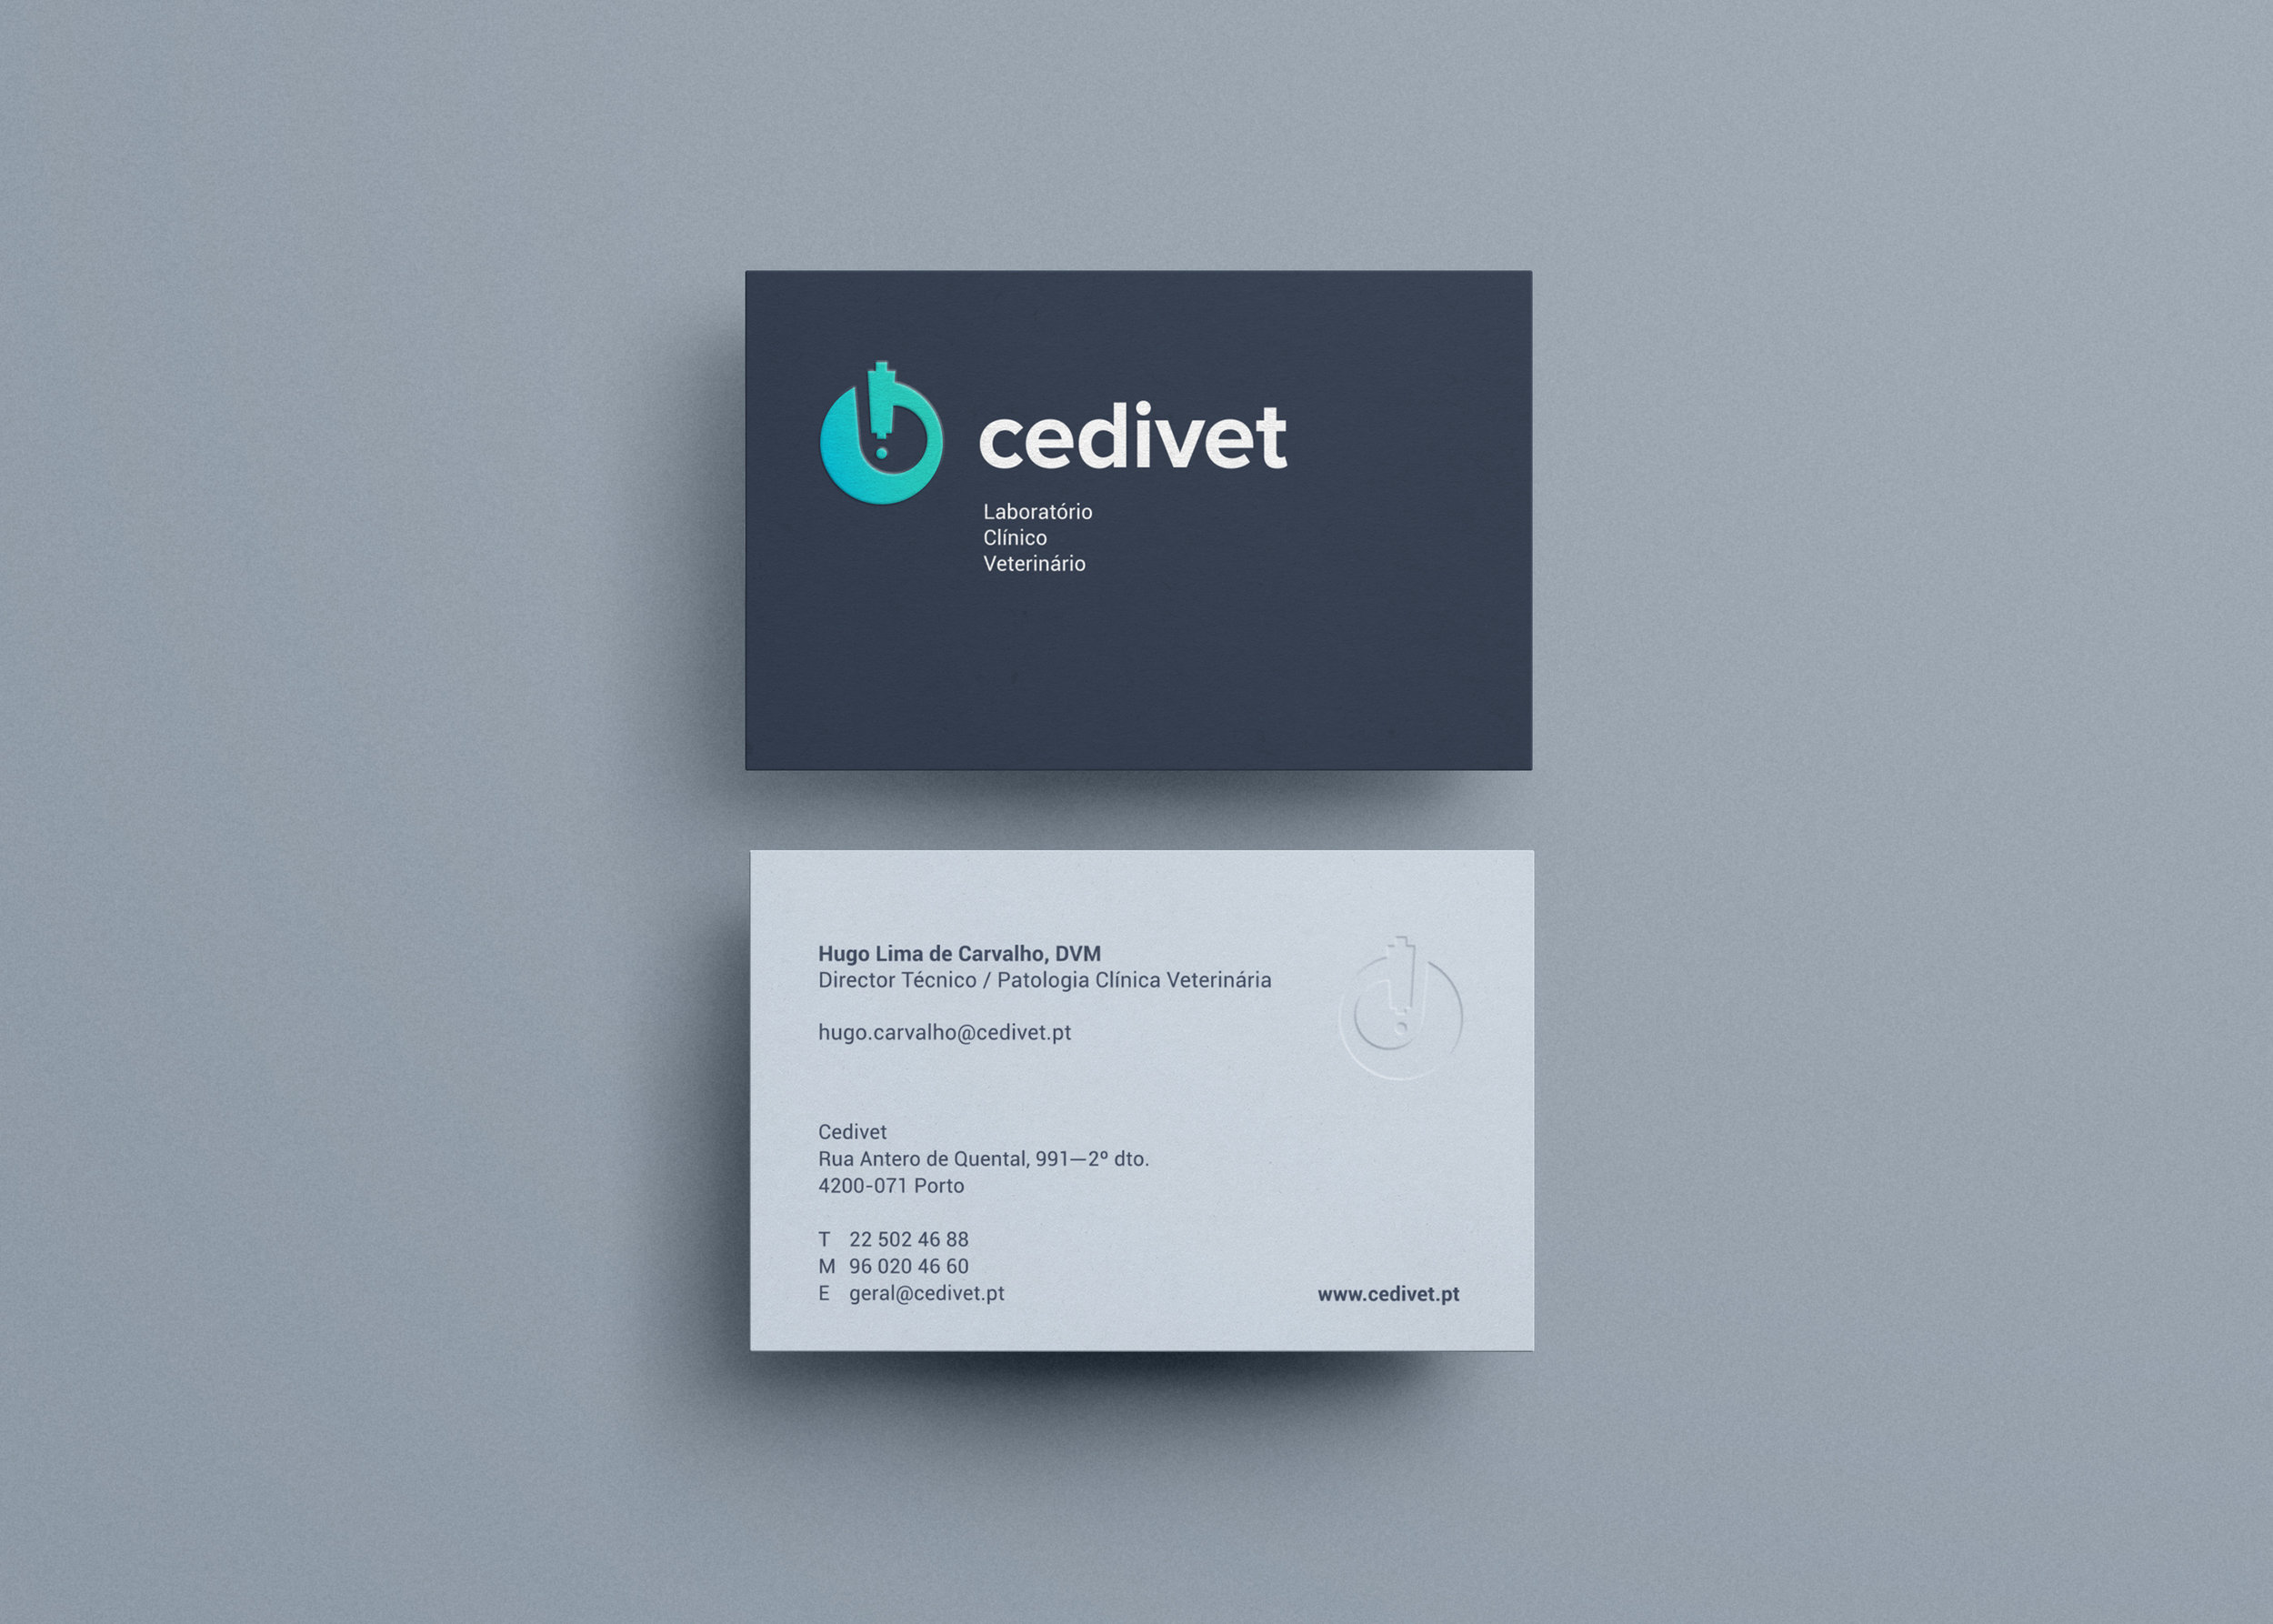 Cedivet Veterinary Lab business cards by Gen design studio